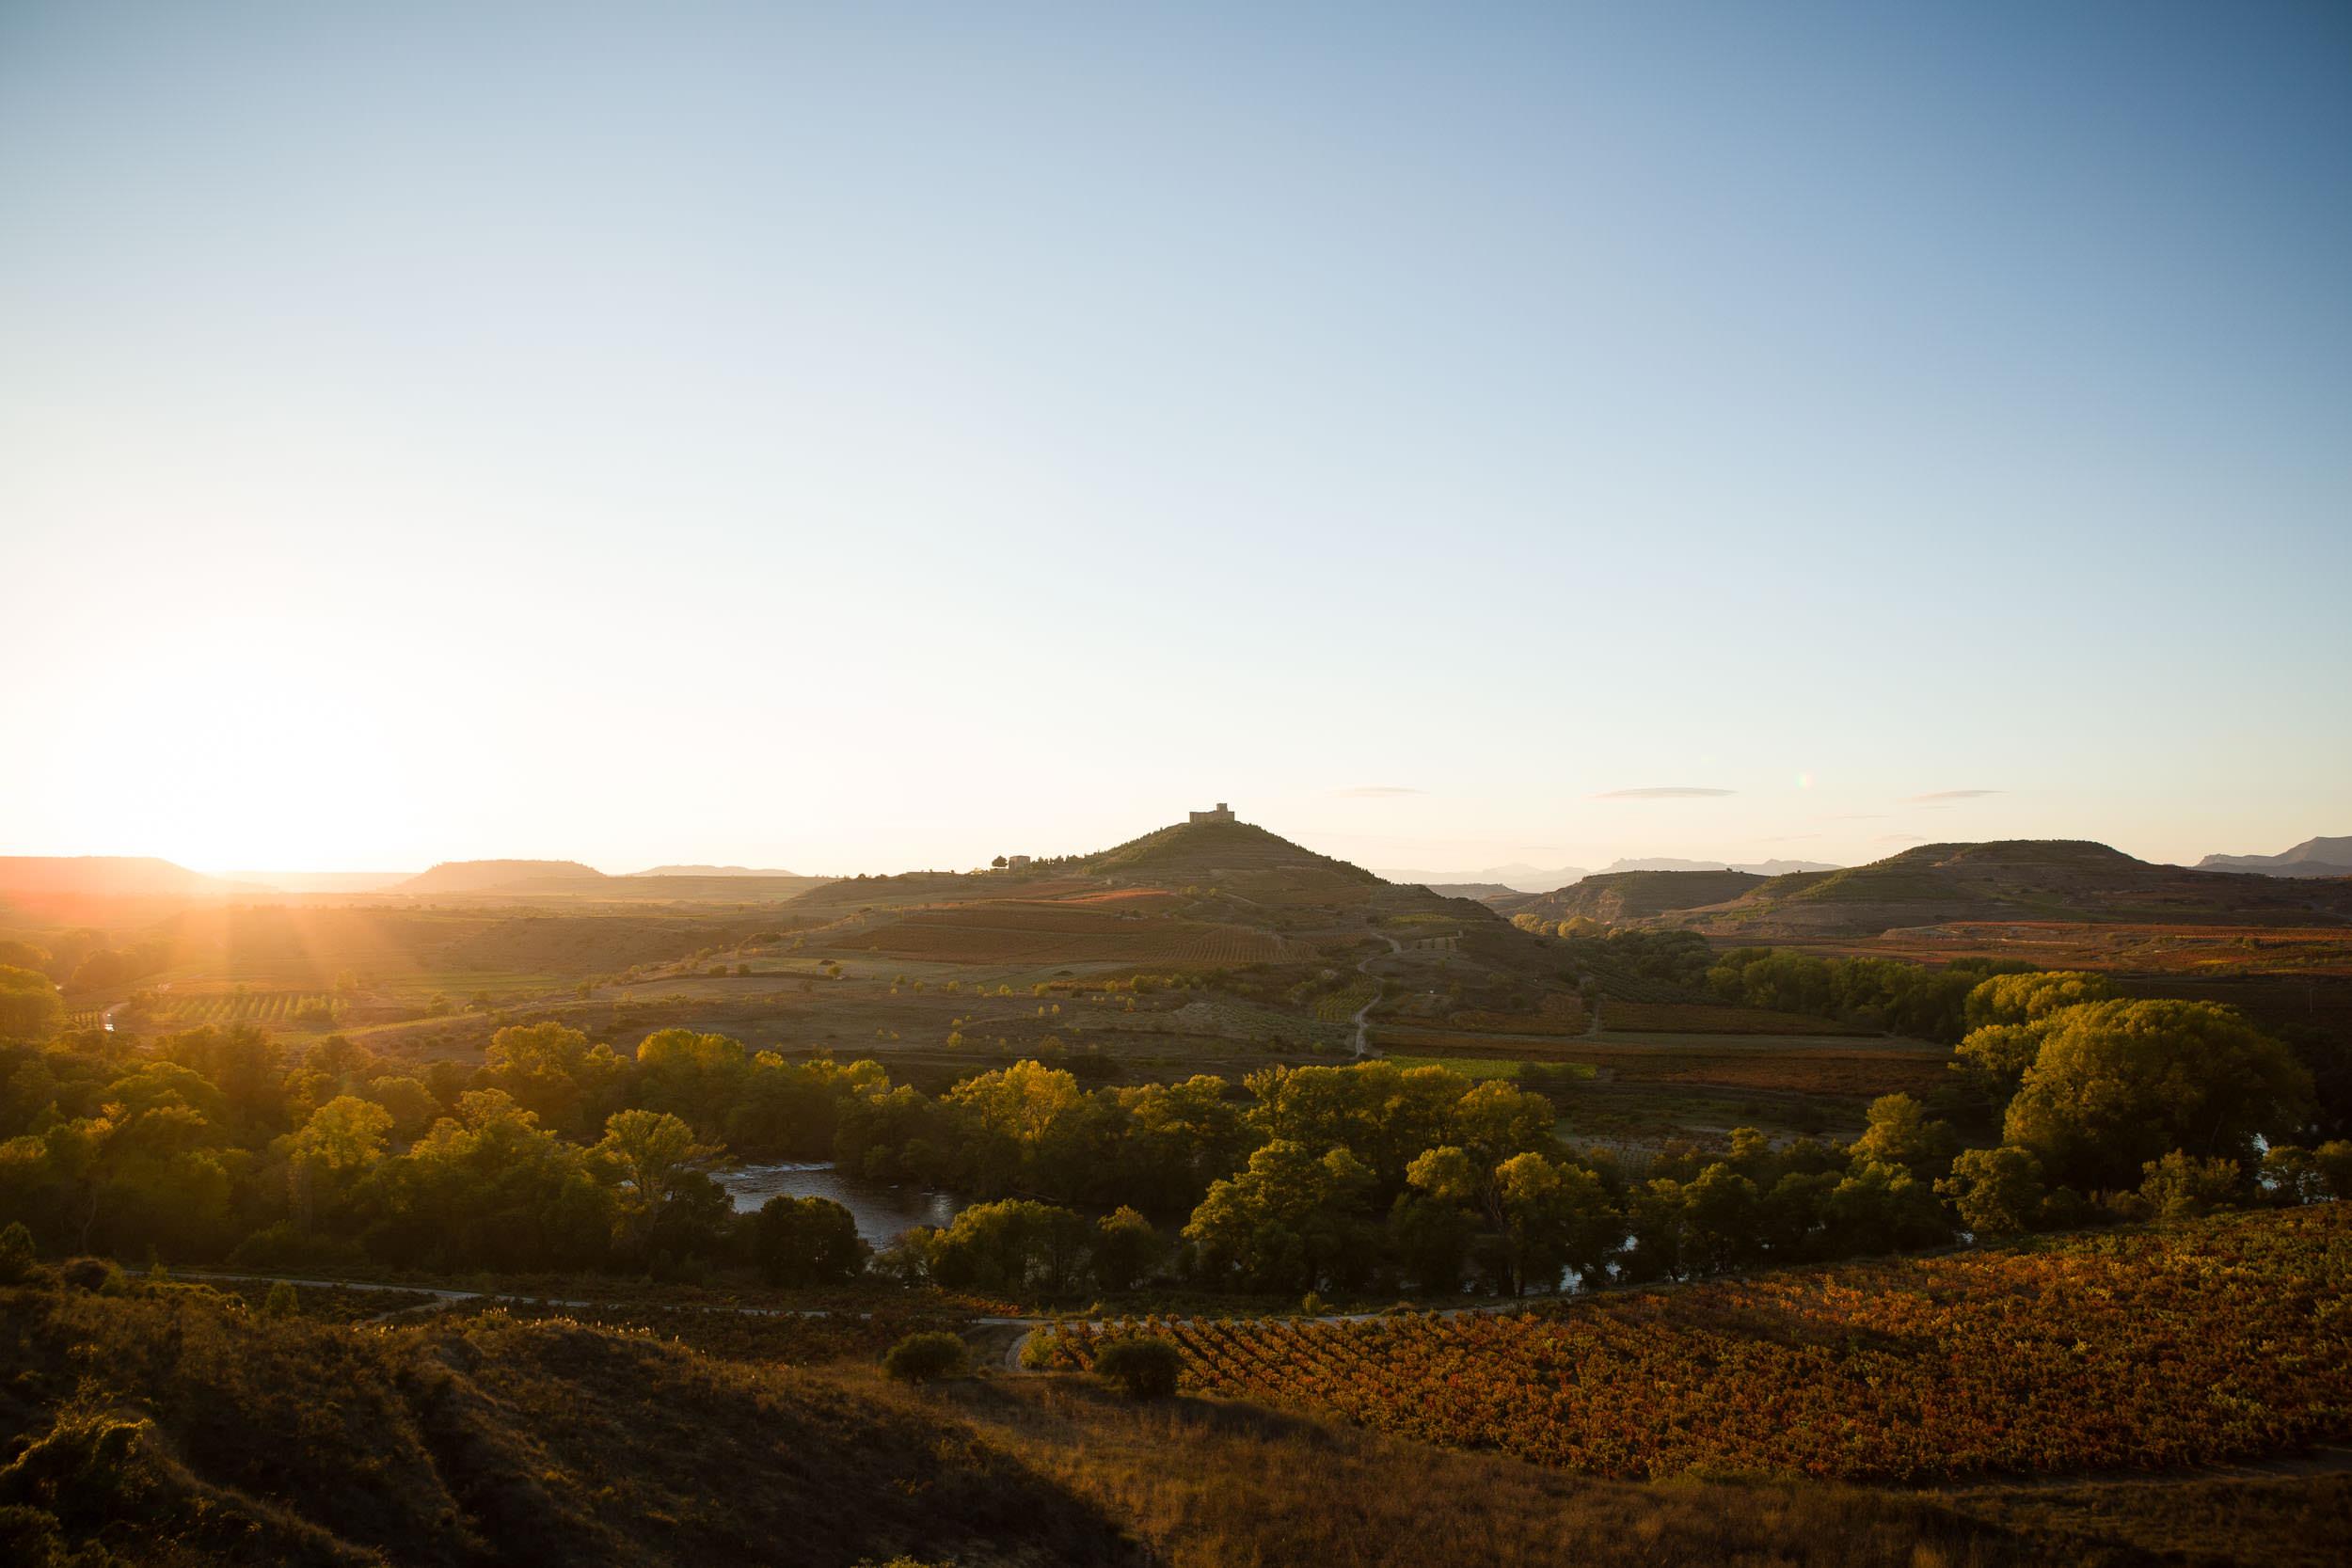 Fotoperiodismo Fotografia Editorial La Rioja País Vasco España - James Sturcke - sturcke.org_034.jpg